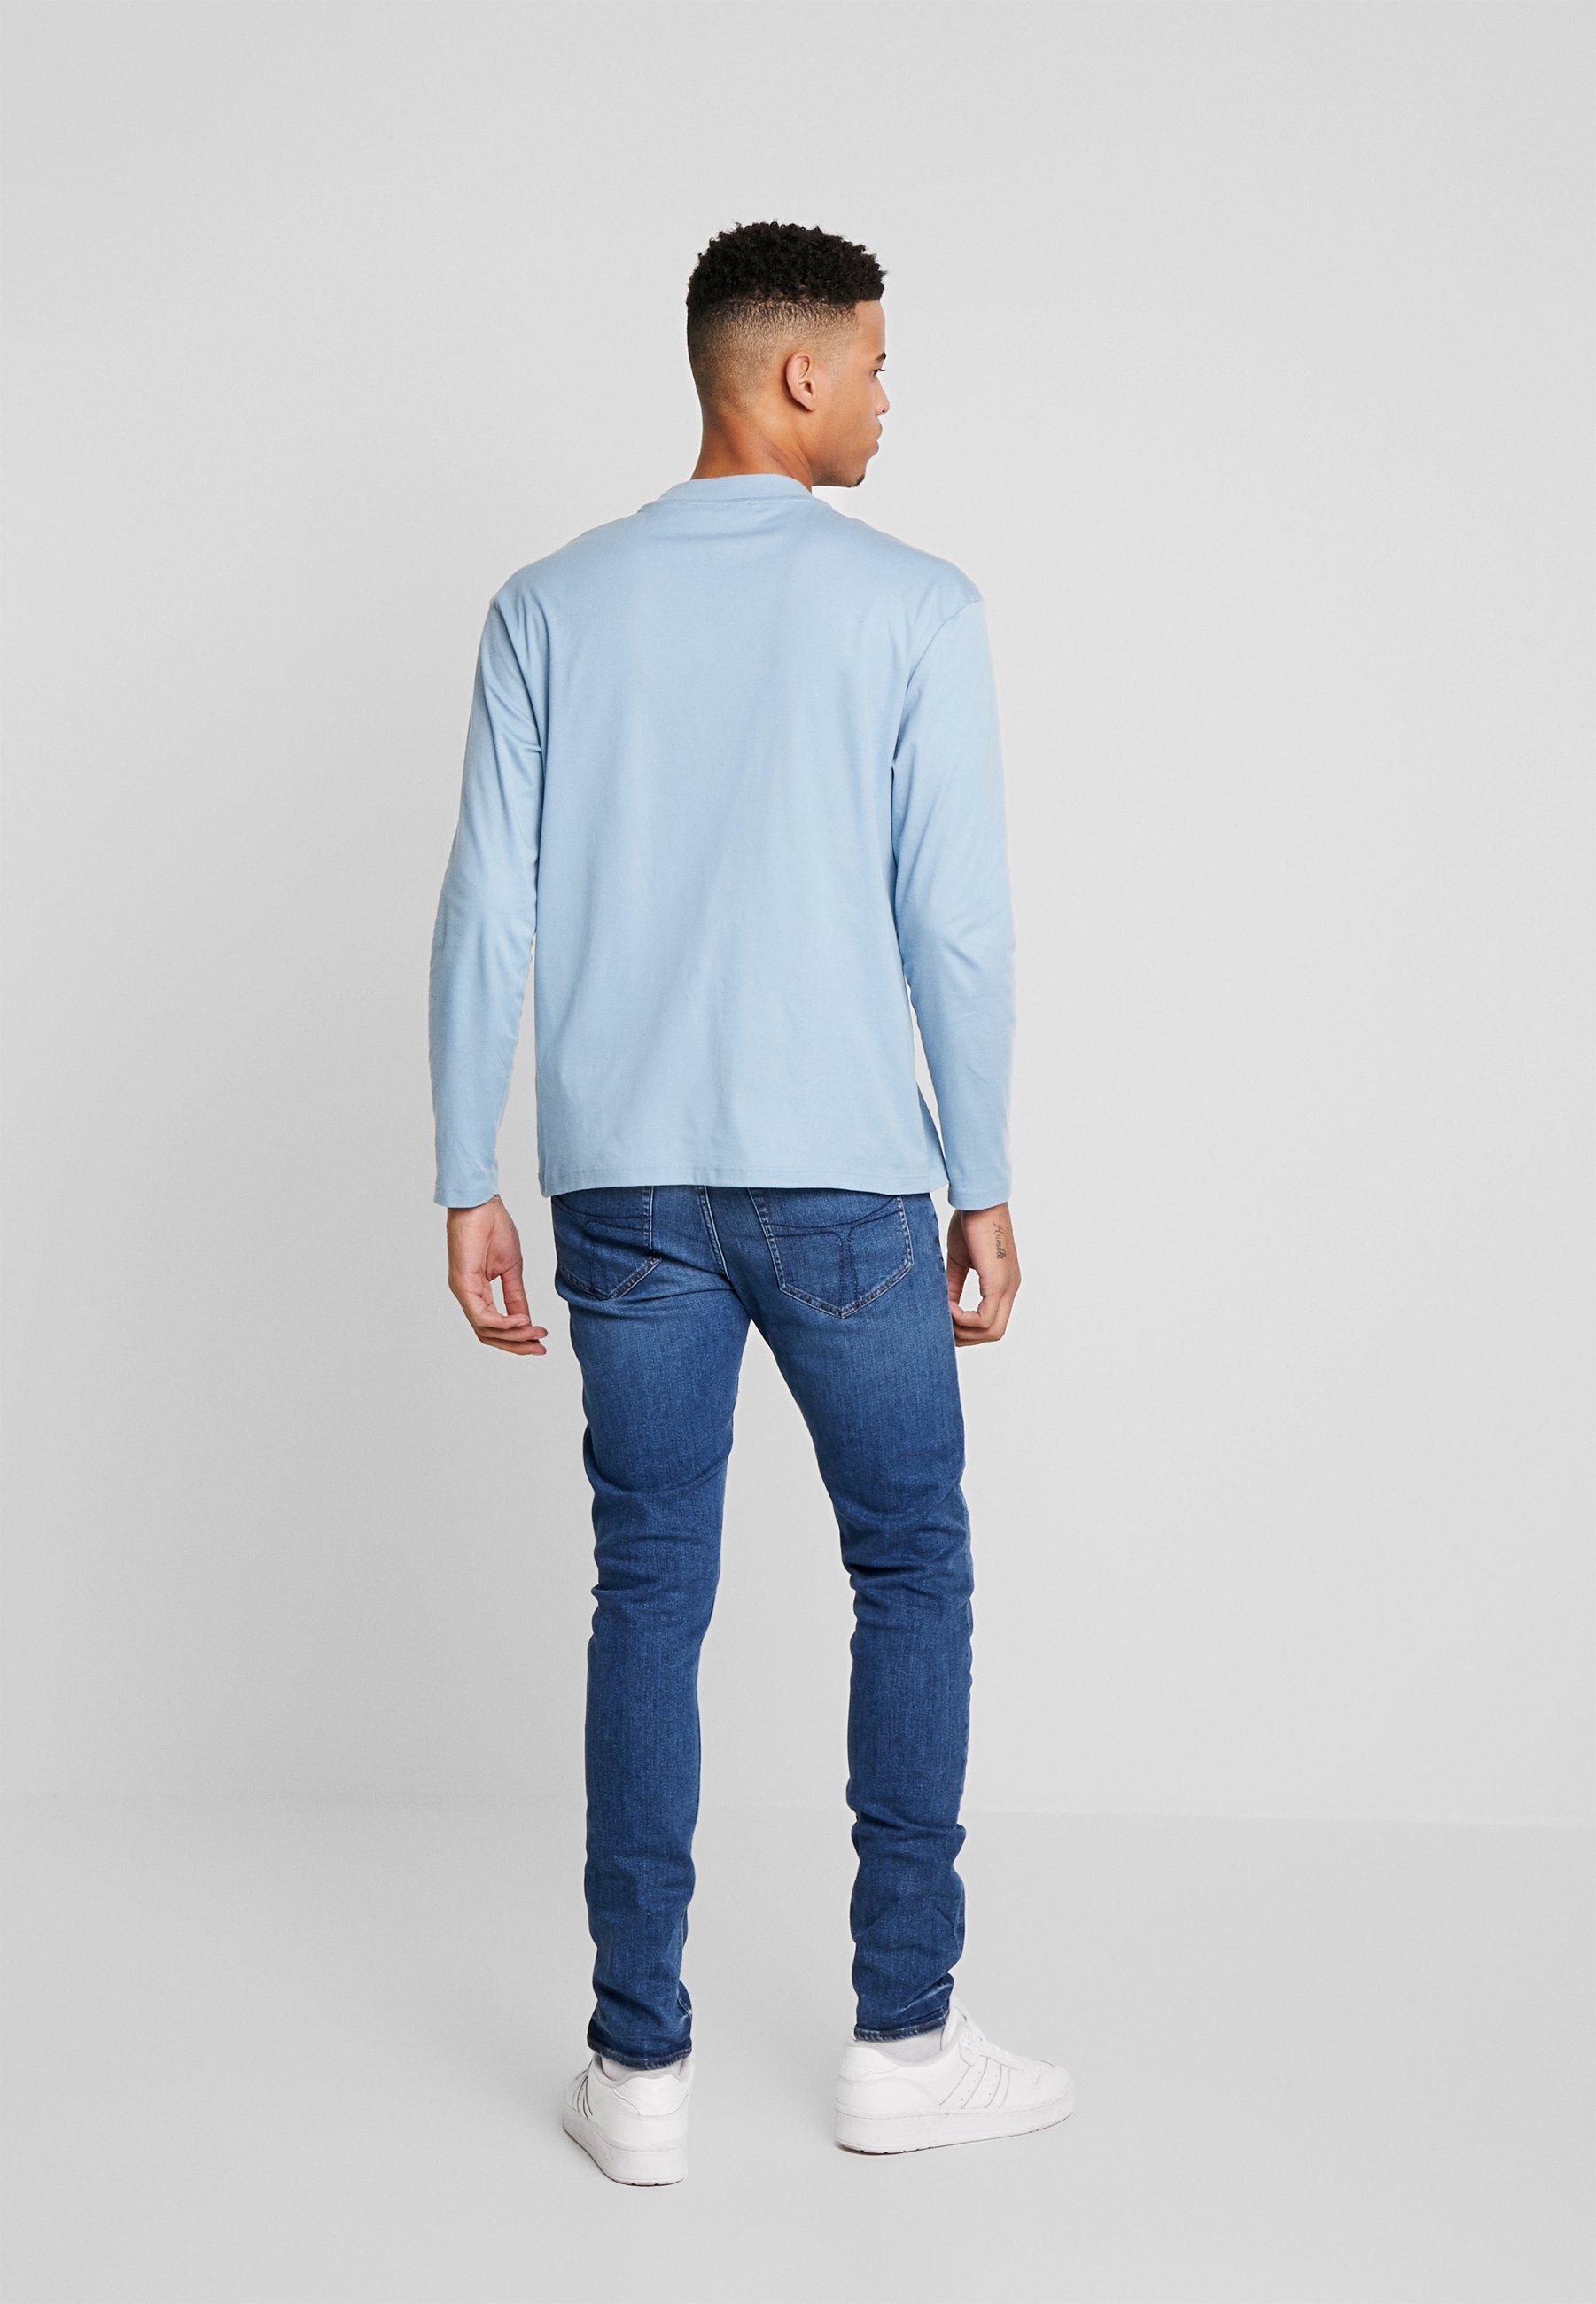 Alennukset Miesten vaatteet Sarja dfKJIUp97454sfGHYHD Tiger of Sweden Jeans EVOLVE Slim fit -farkut medium blue